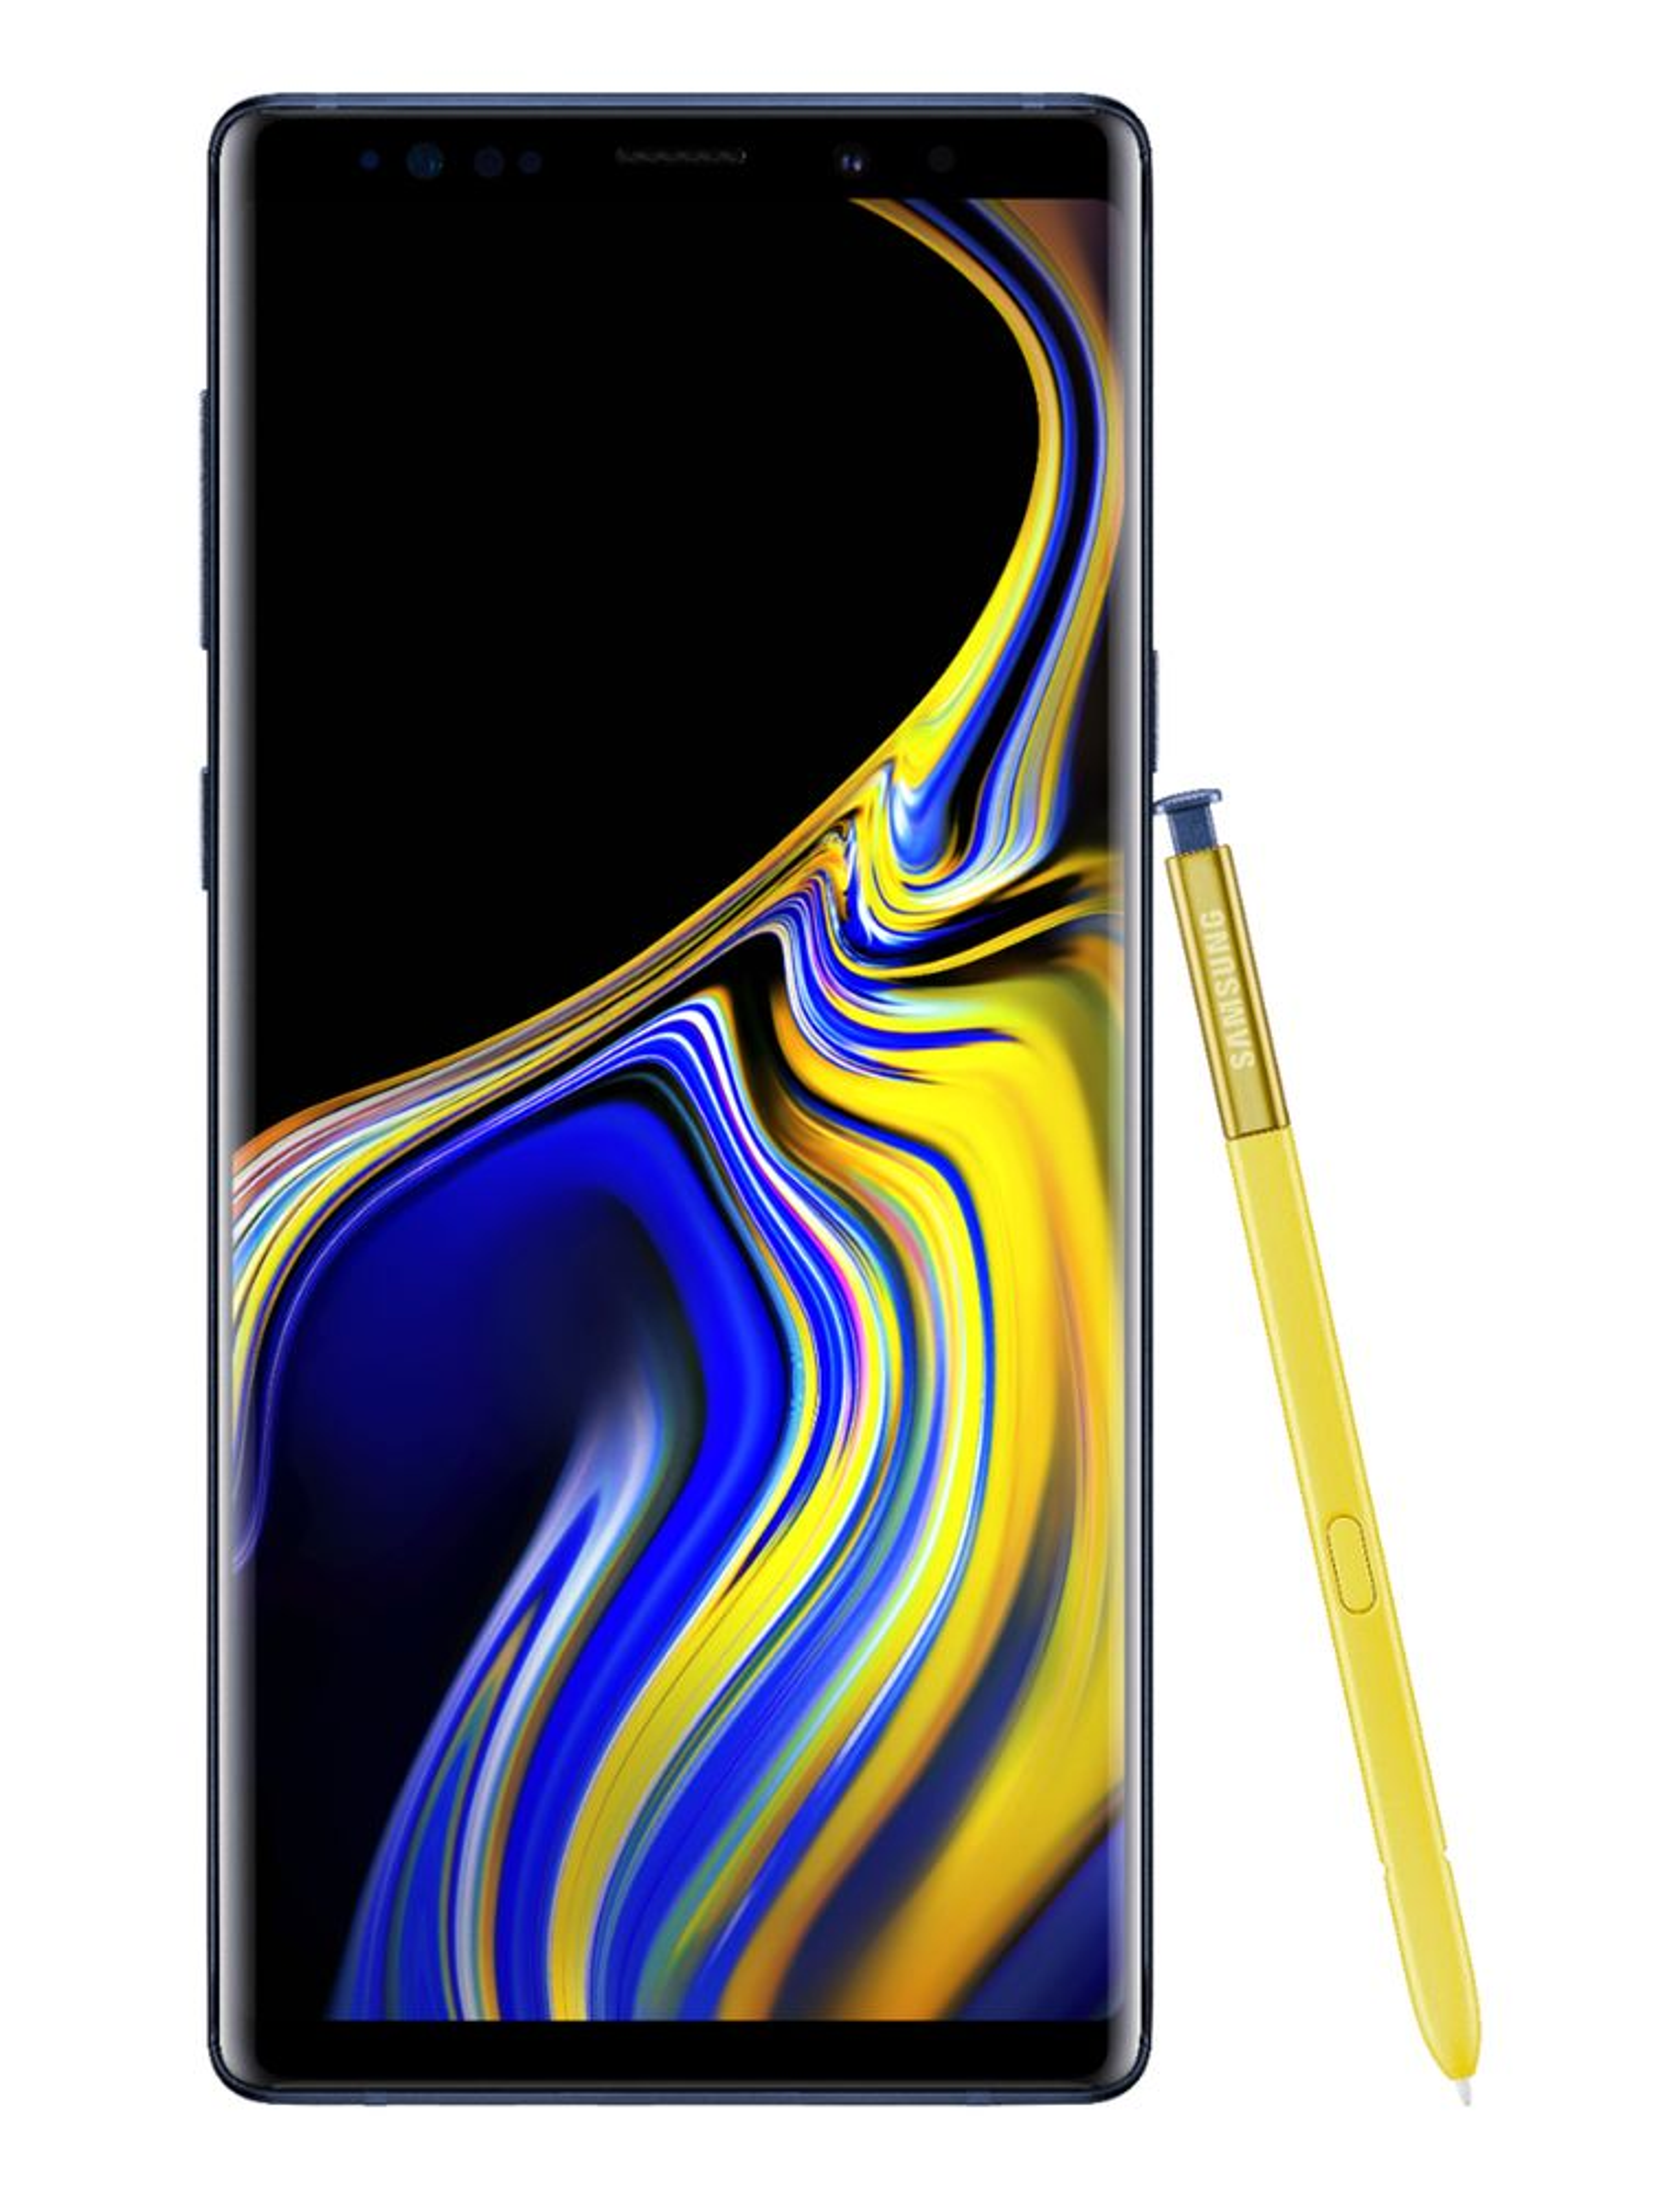 "Samsung Galaxy Note 9 Factory Unlocked Phone With 6.4"" Screen & 128gb (U.s. Warranty), Ocean Blue"